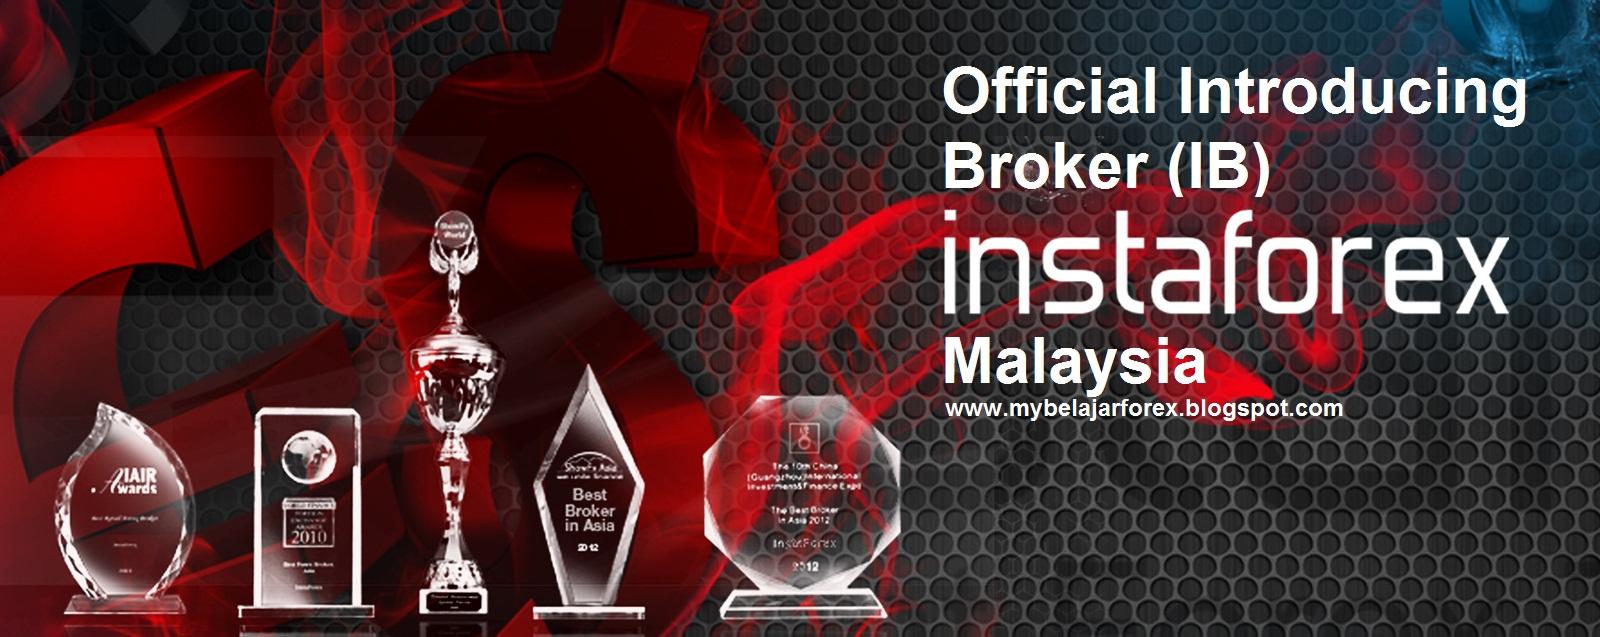 InstaForex Malaysia | InstaForex Kuala Lumpur | InstaForex Selangor | InstaForex Kedah